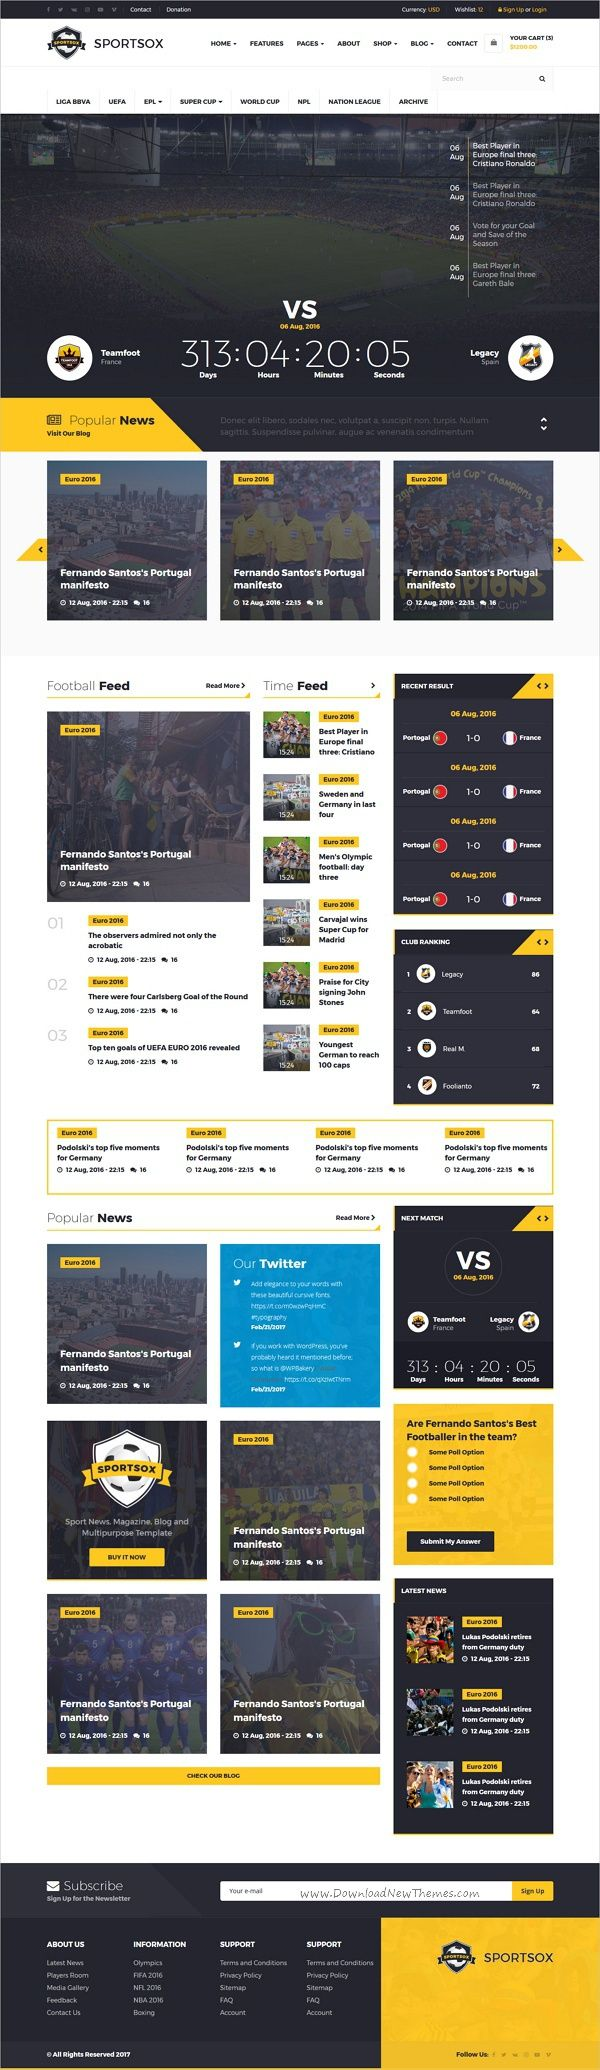 Sportsox | Sport Team Clubs HTML Template | Template, Mobile design ...